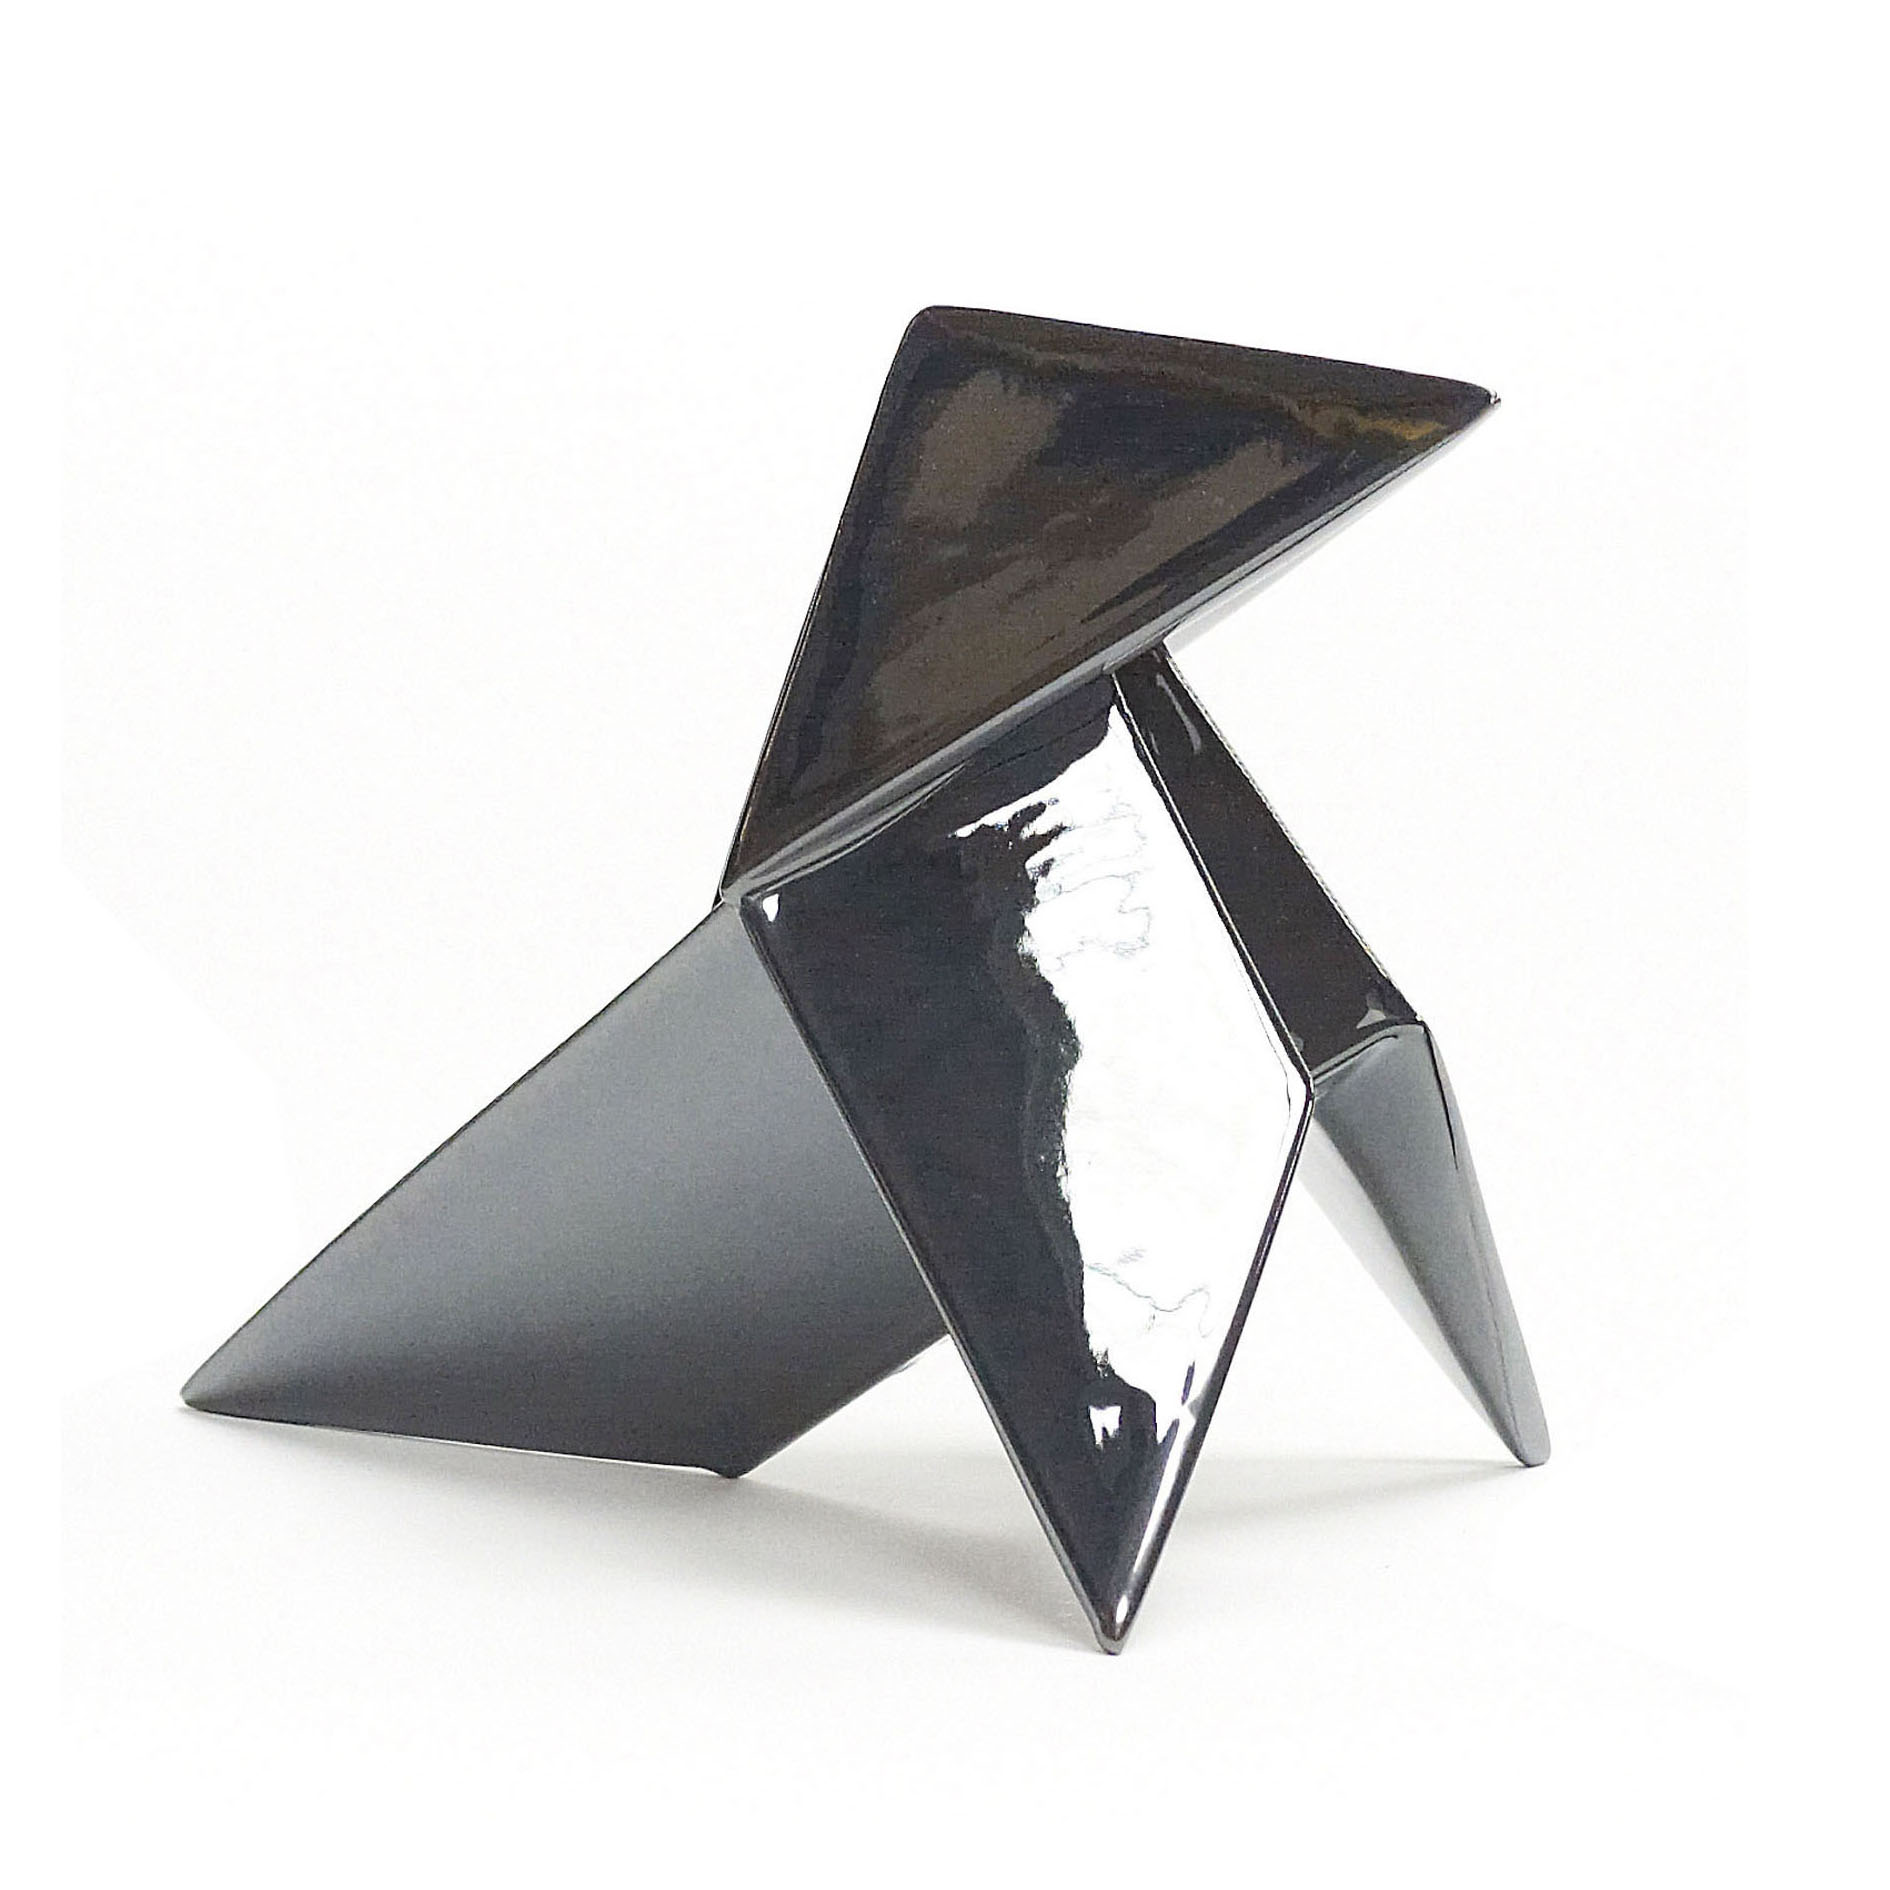 Ceramic object medium h21cm origami ceramic object medium h21cm jeuxipadfo Choice Image